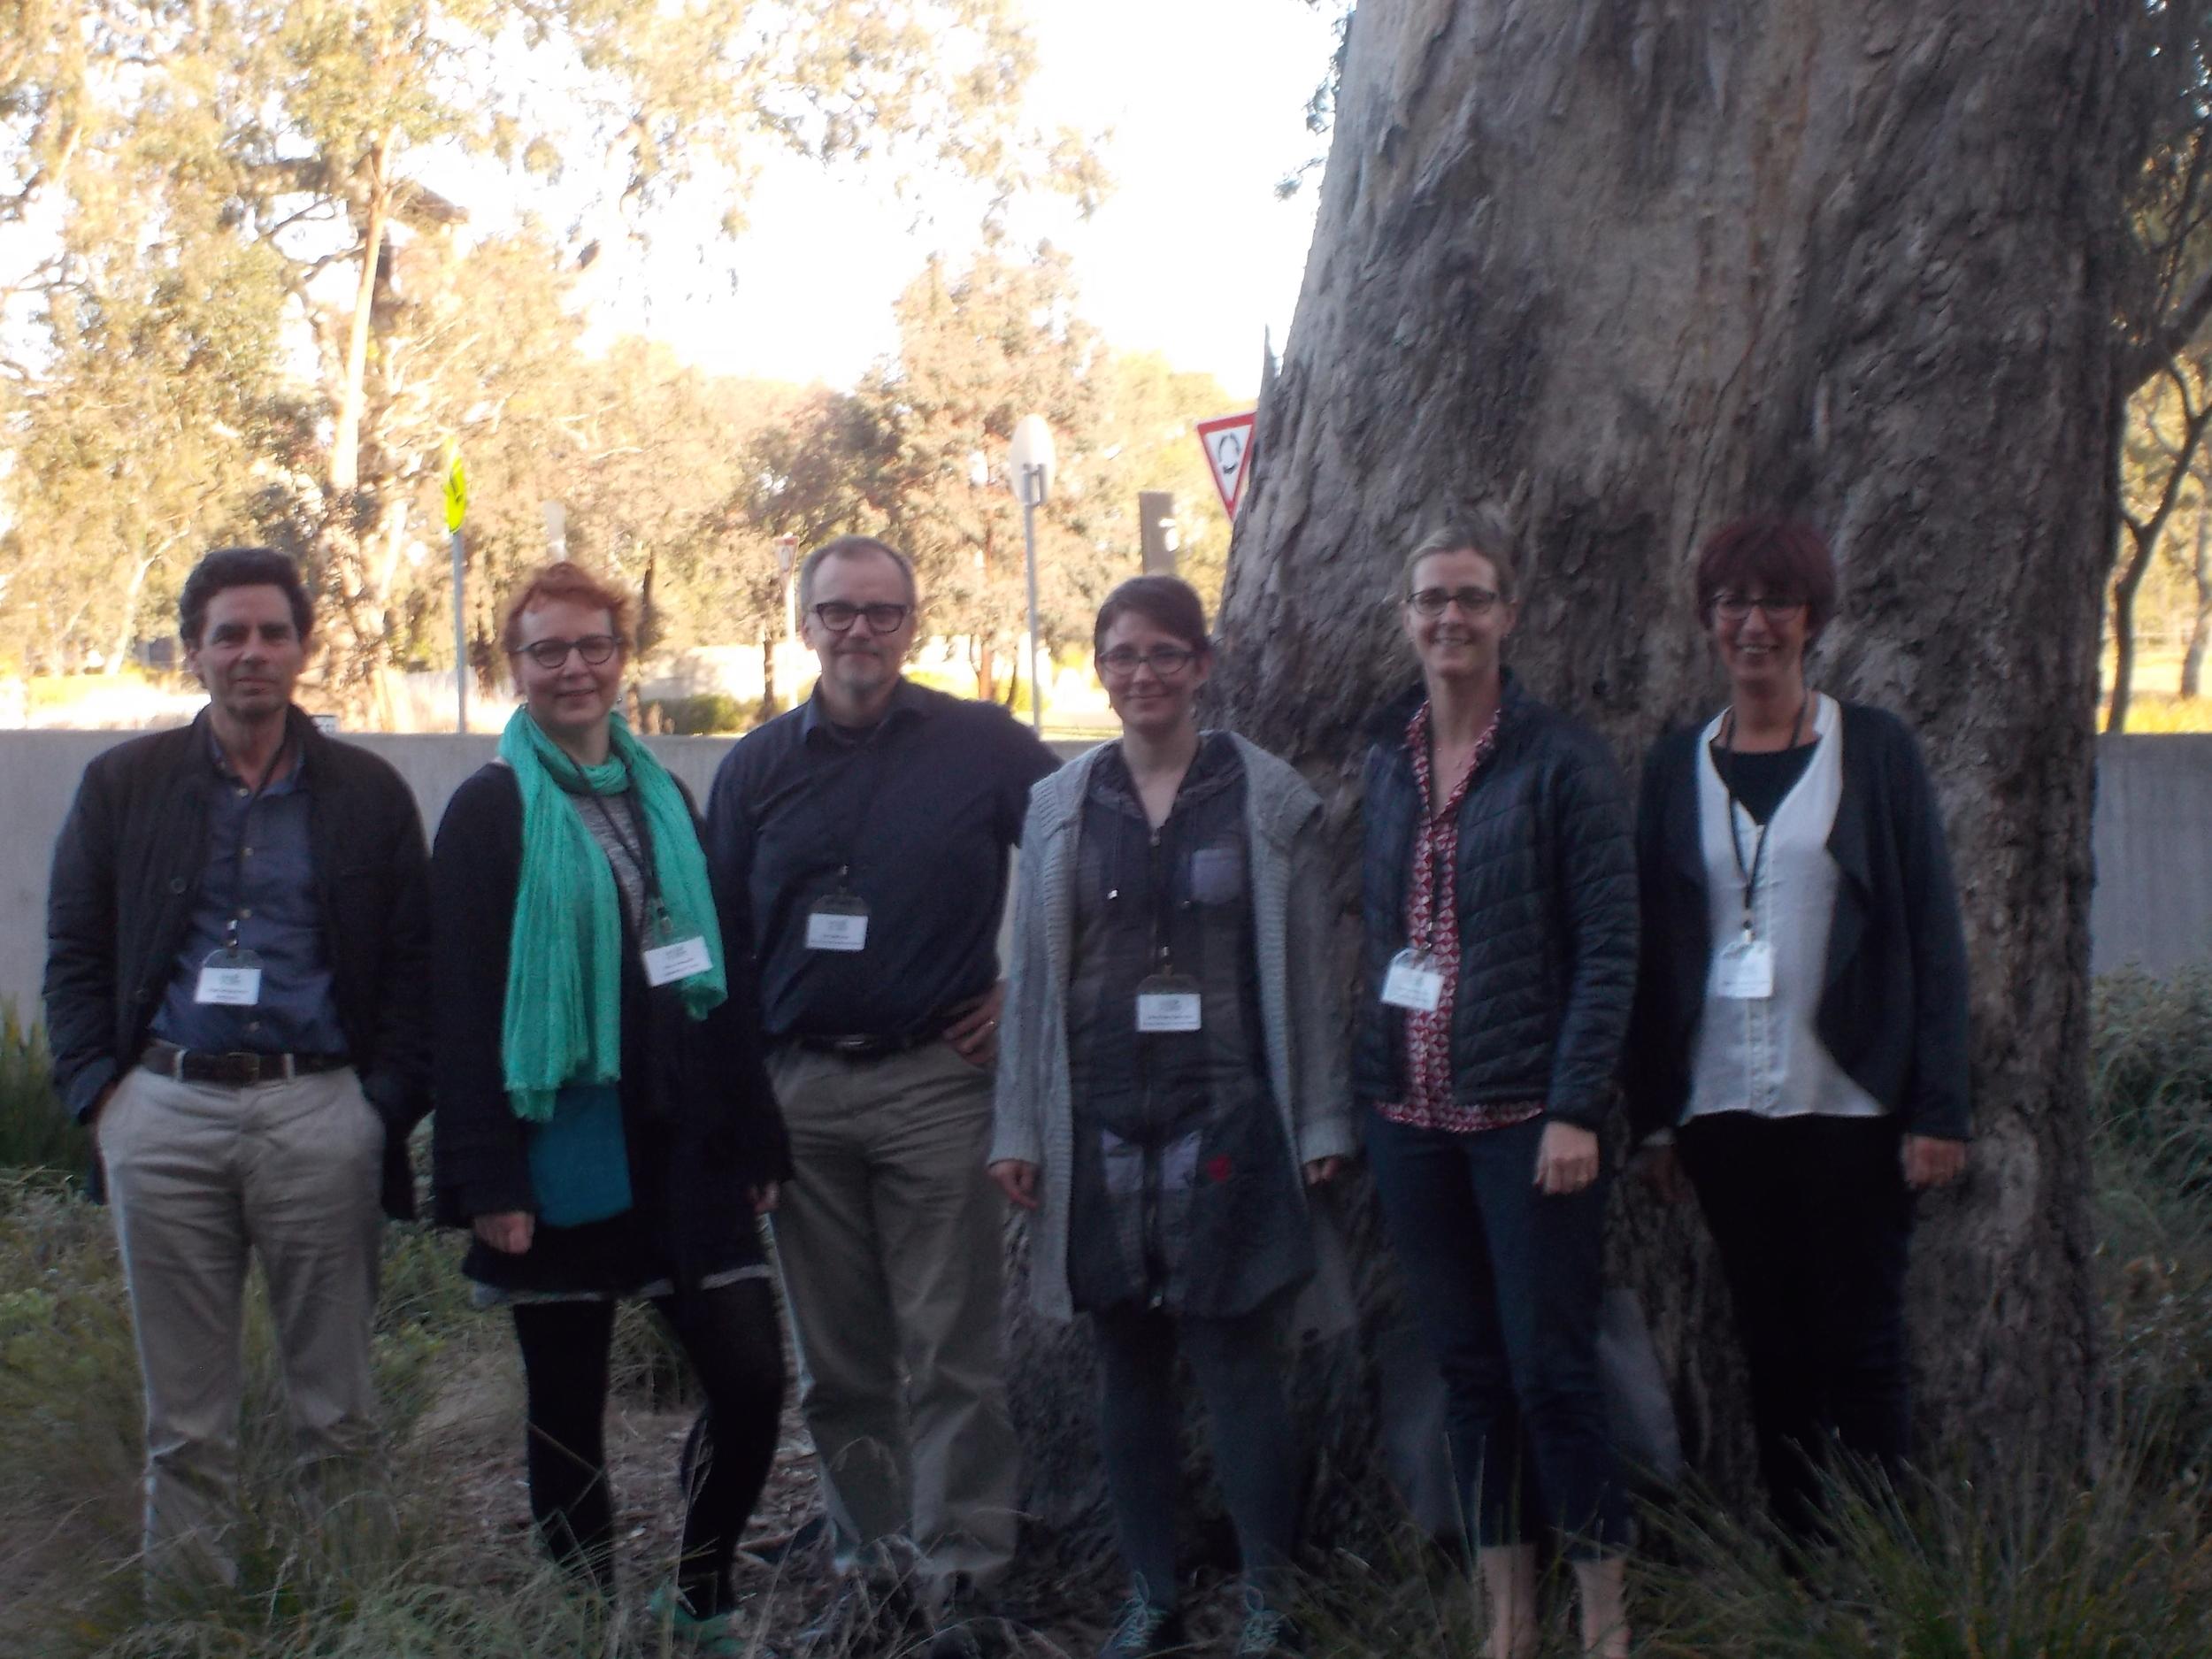 Annual team meeting in Melbourne, Australia.